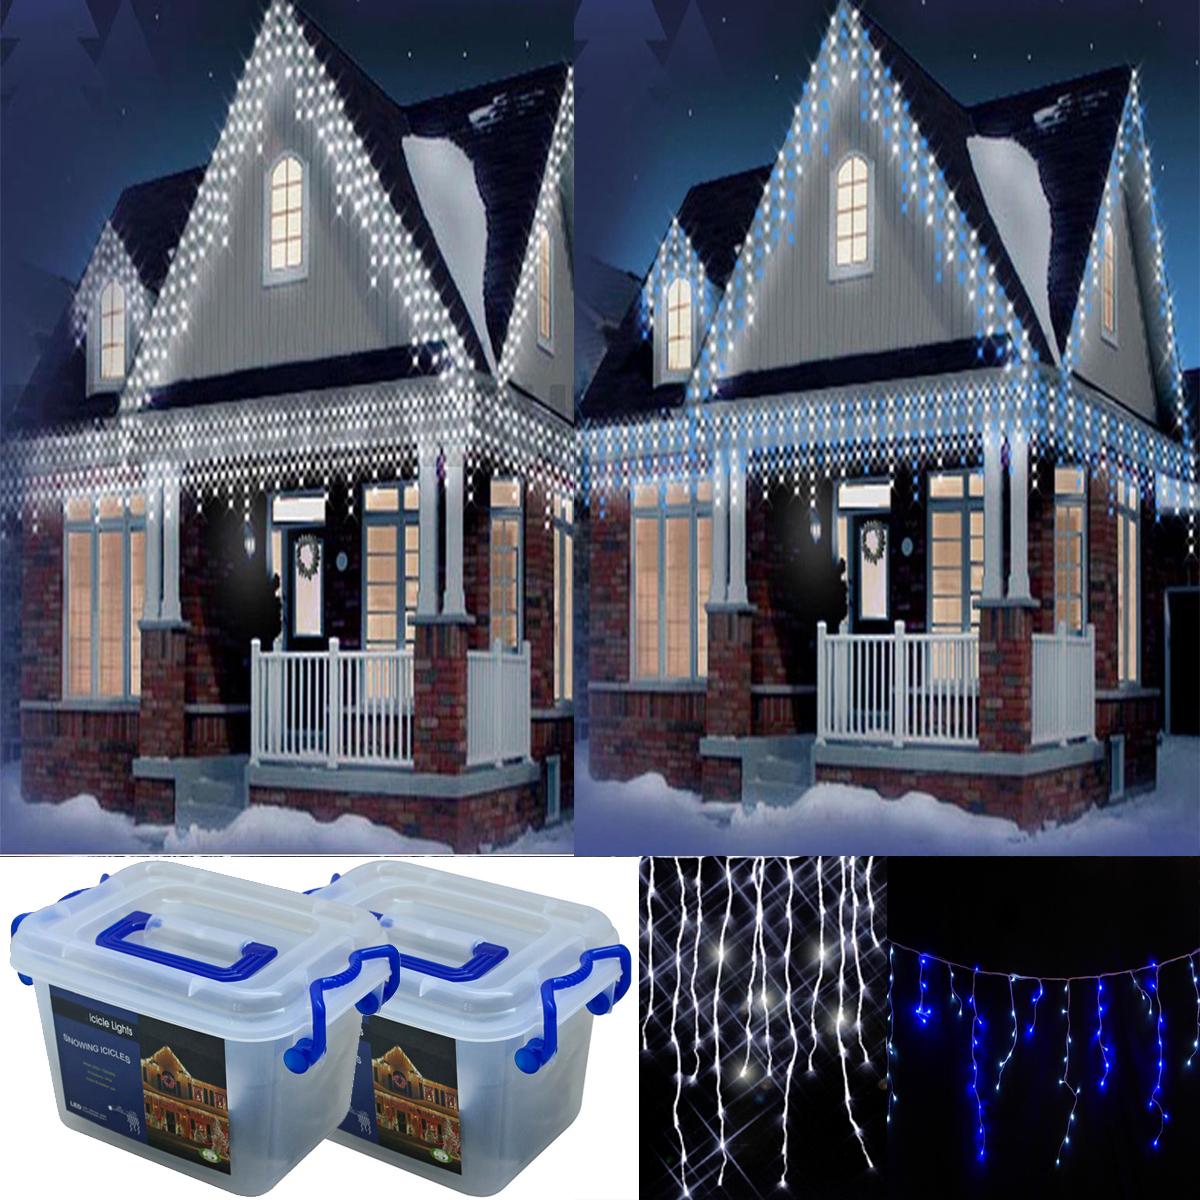 Snowing Christmas Lights.Christmas 720 White Blue White Icicle Led Xmas Snowing